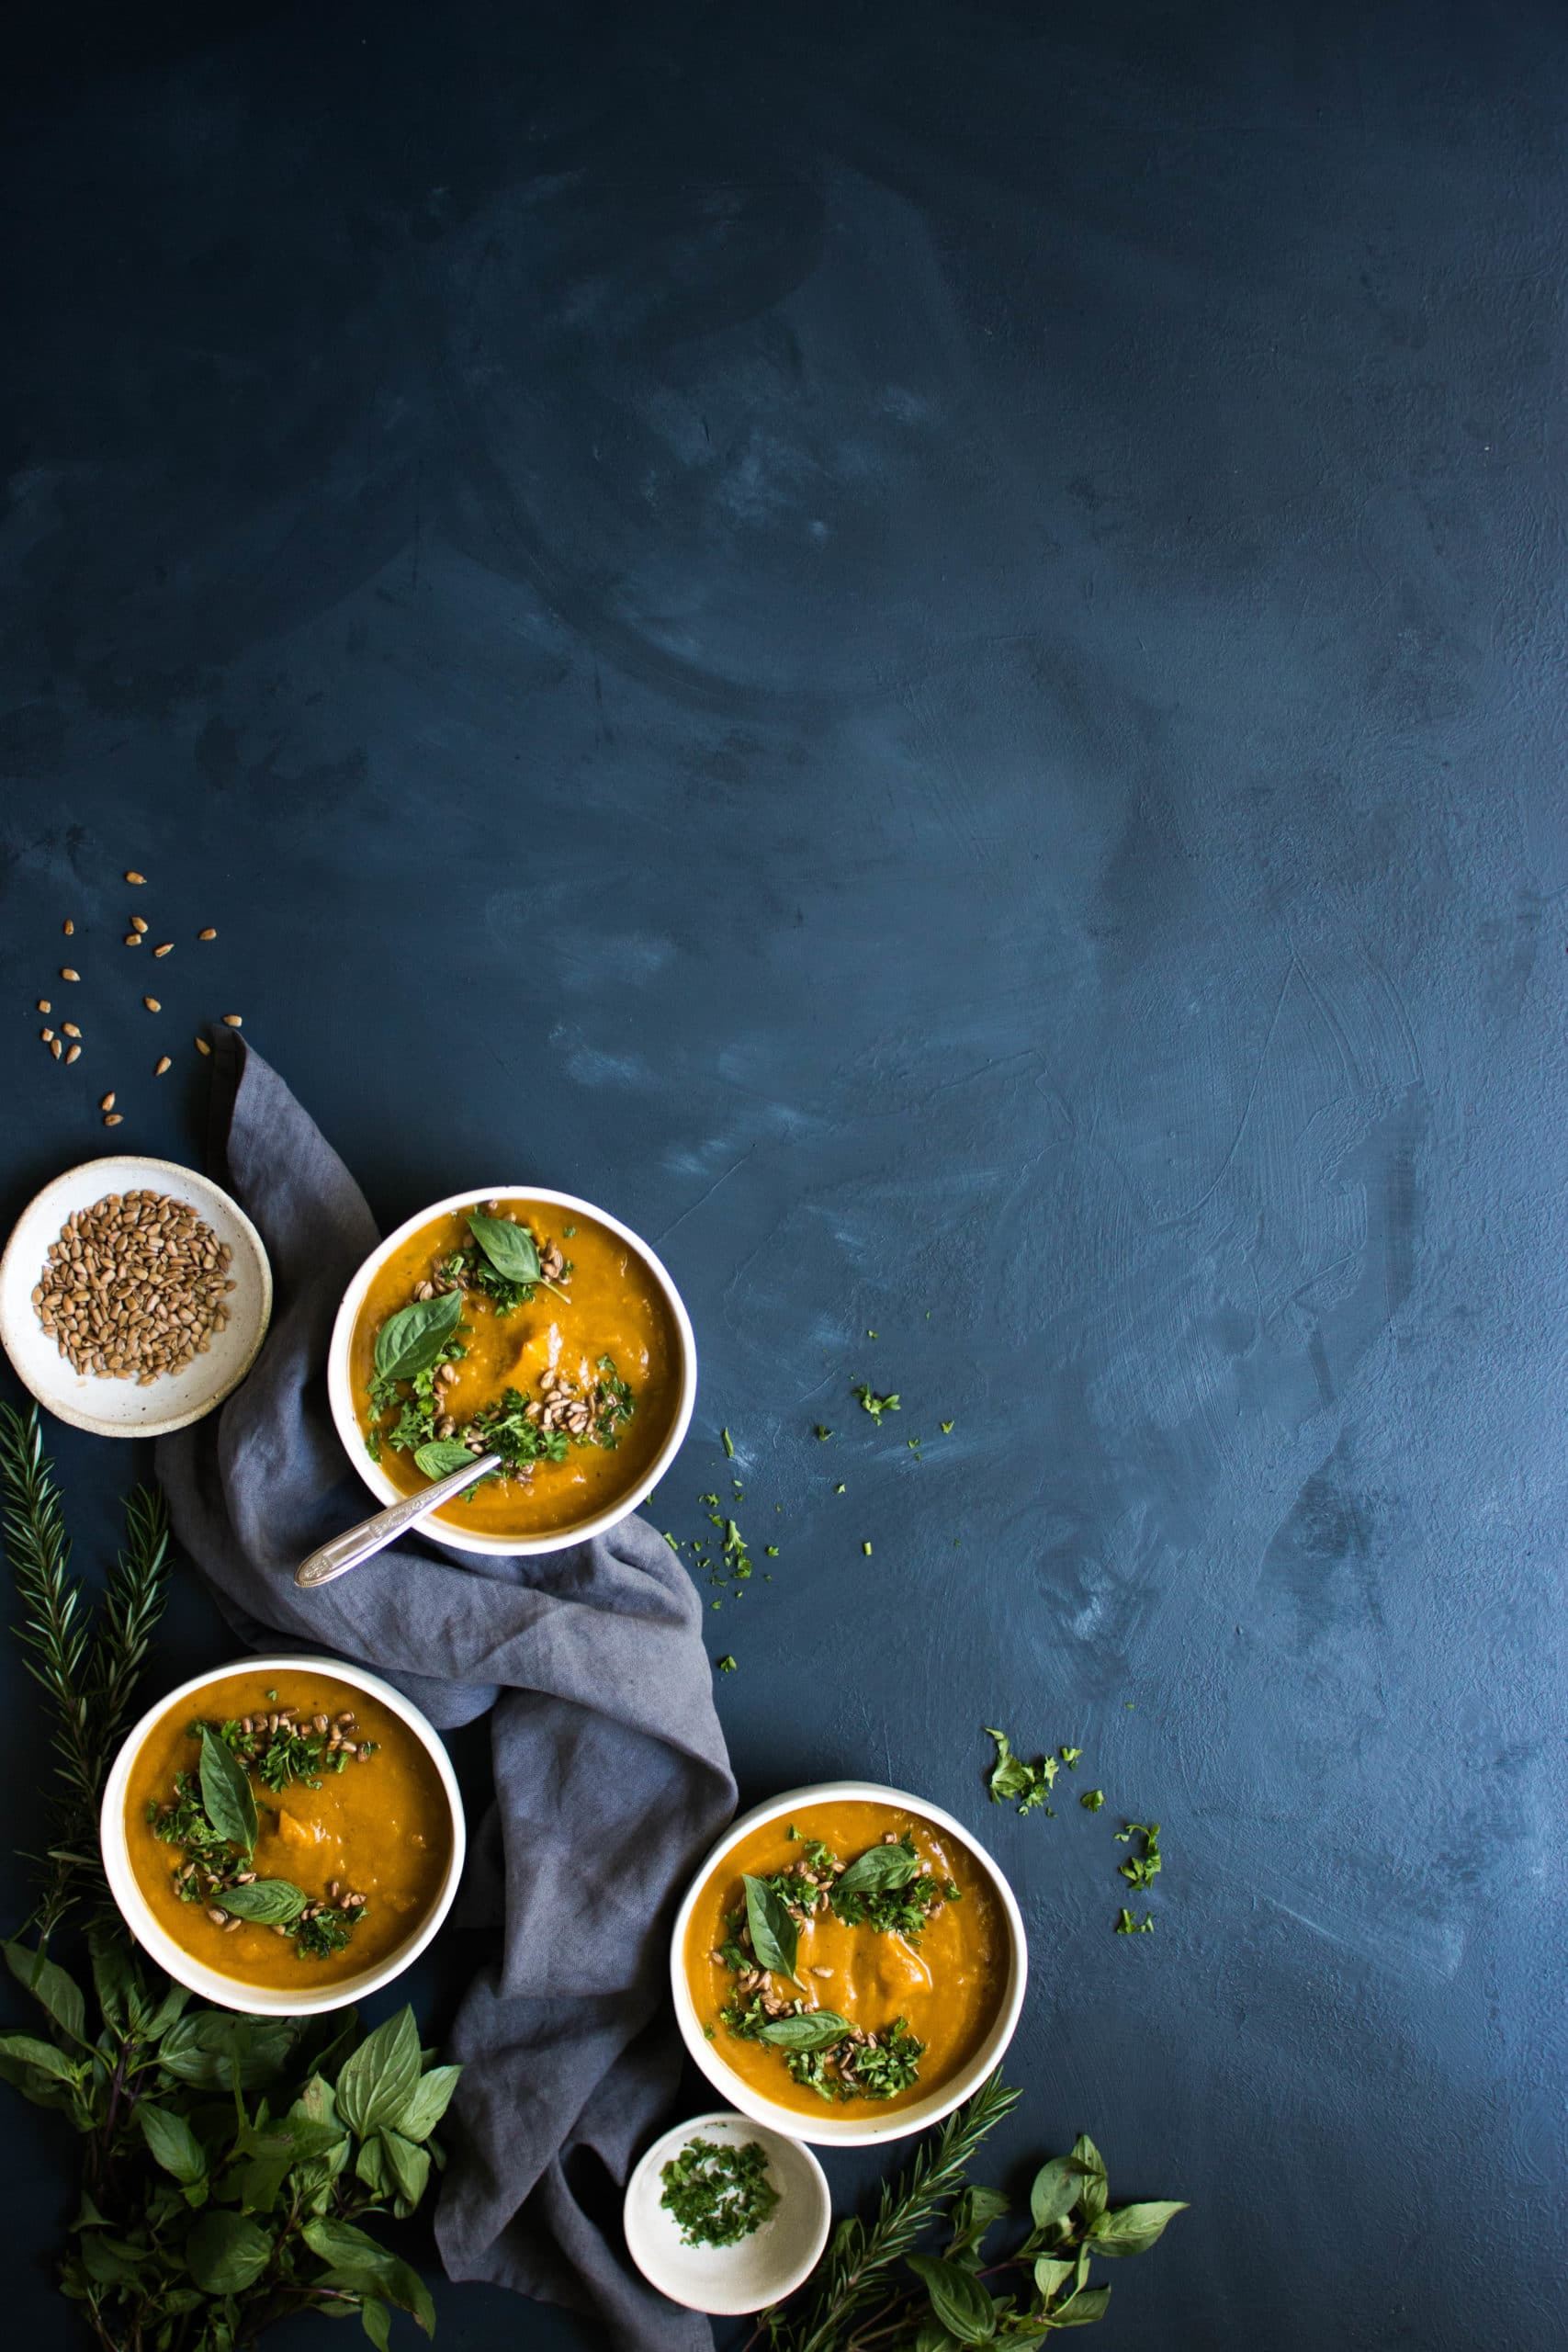 gluten free dinner, autumn meals, dairy free dinner, vegan dinner inspiration